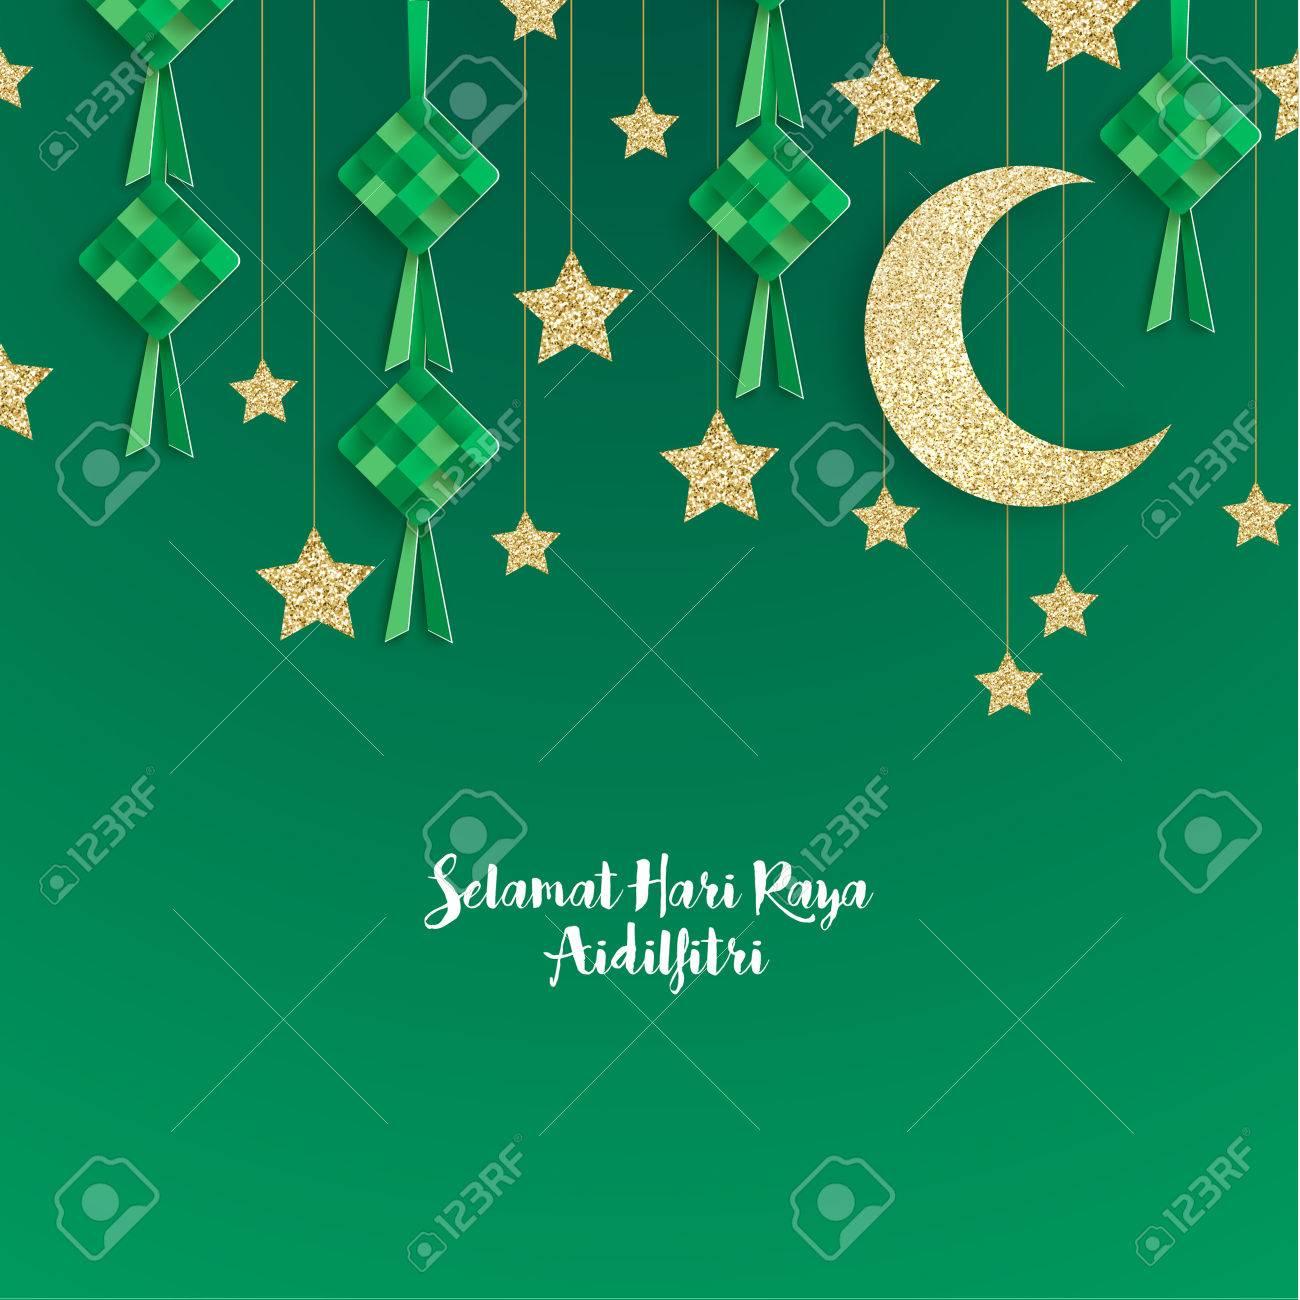 Amazing Official Eid Al-Fitr Greeting - 62025164-eid-al-fitr-greeting-vector-design-celebration-of-breaking-fast  Picture_773286 .jpg